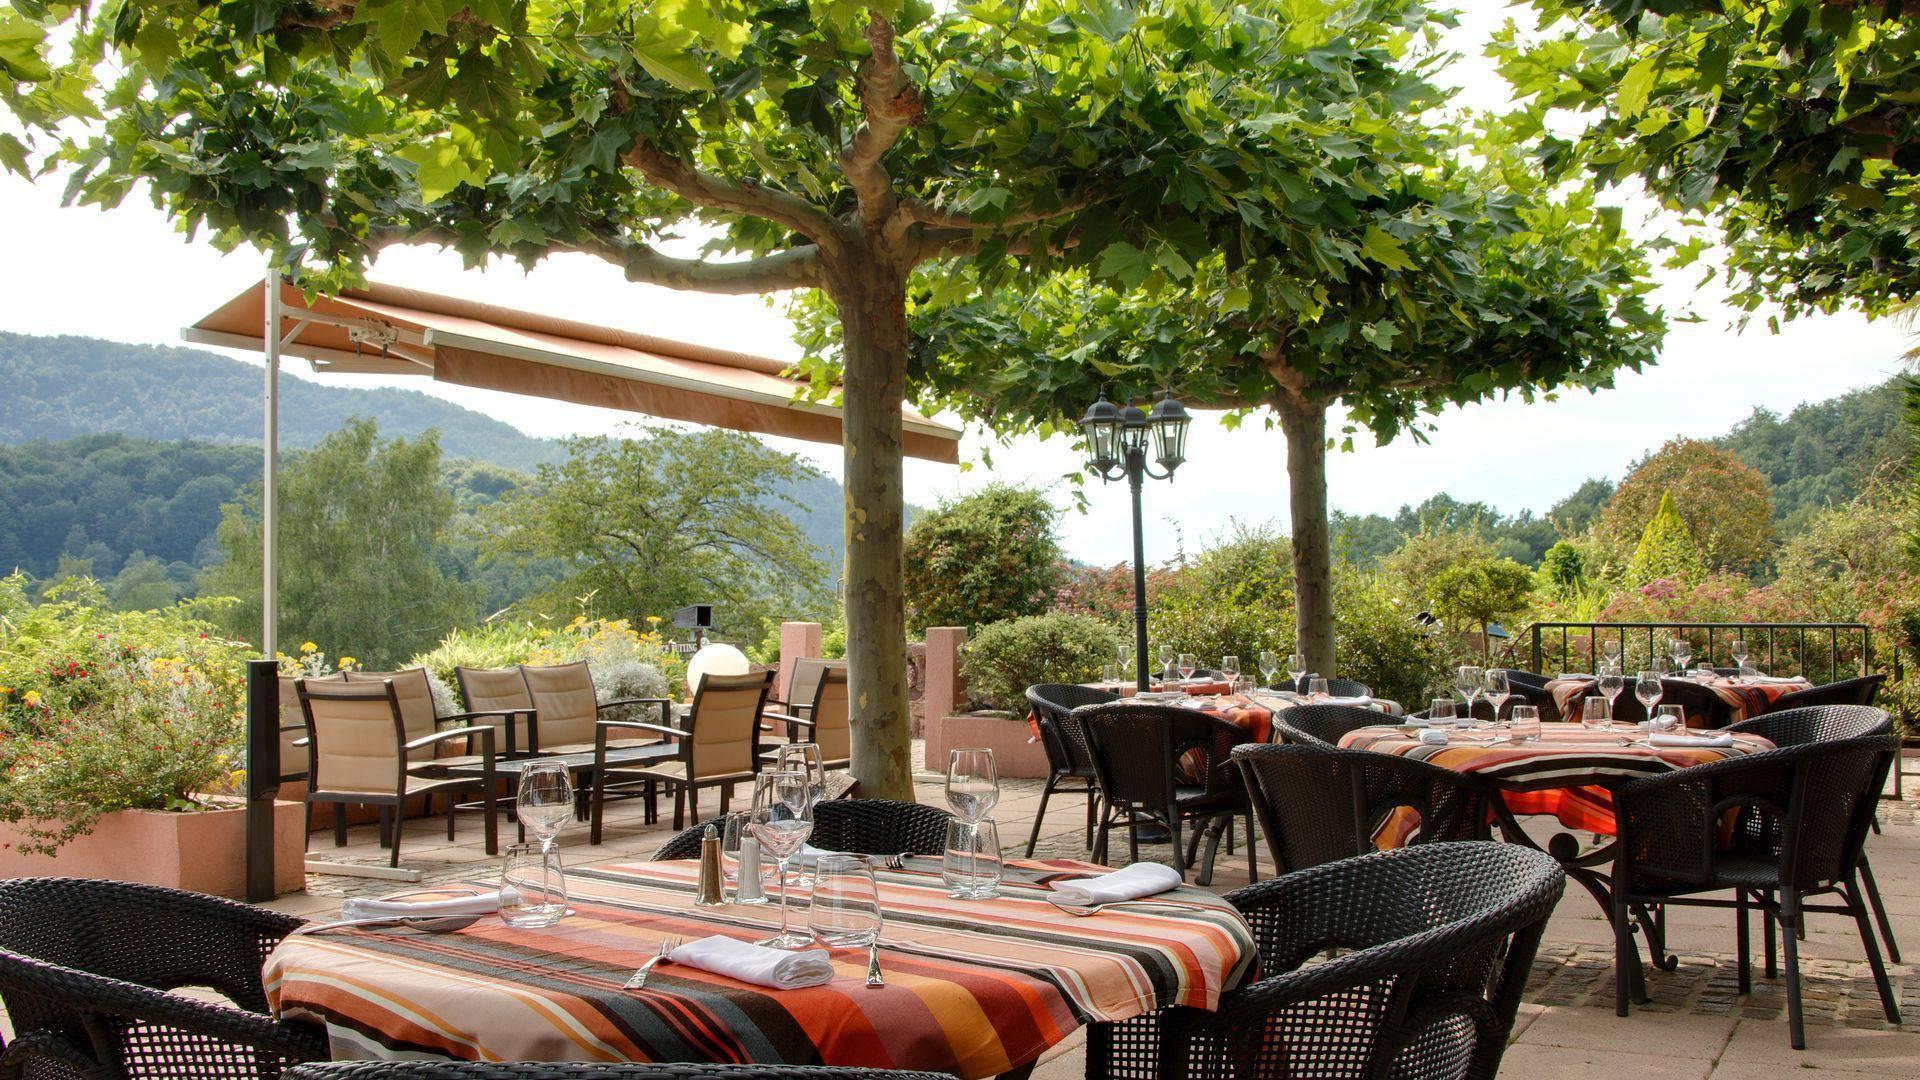 Le-Domaine-de-Falgos-Golf-Spa-occitanie-terrasse-seminaires-de-caractere